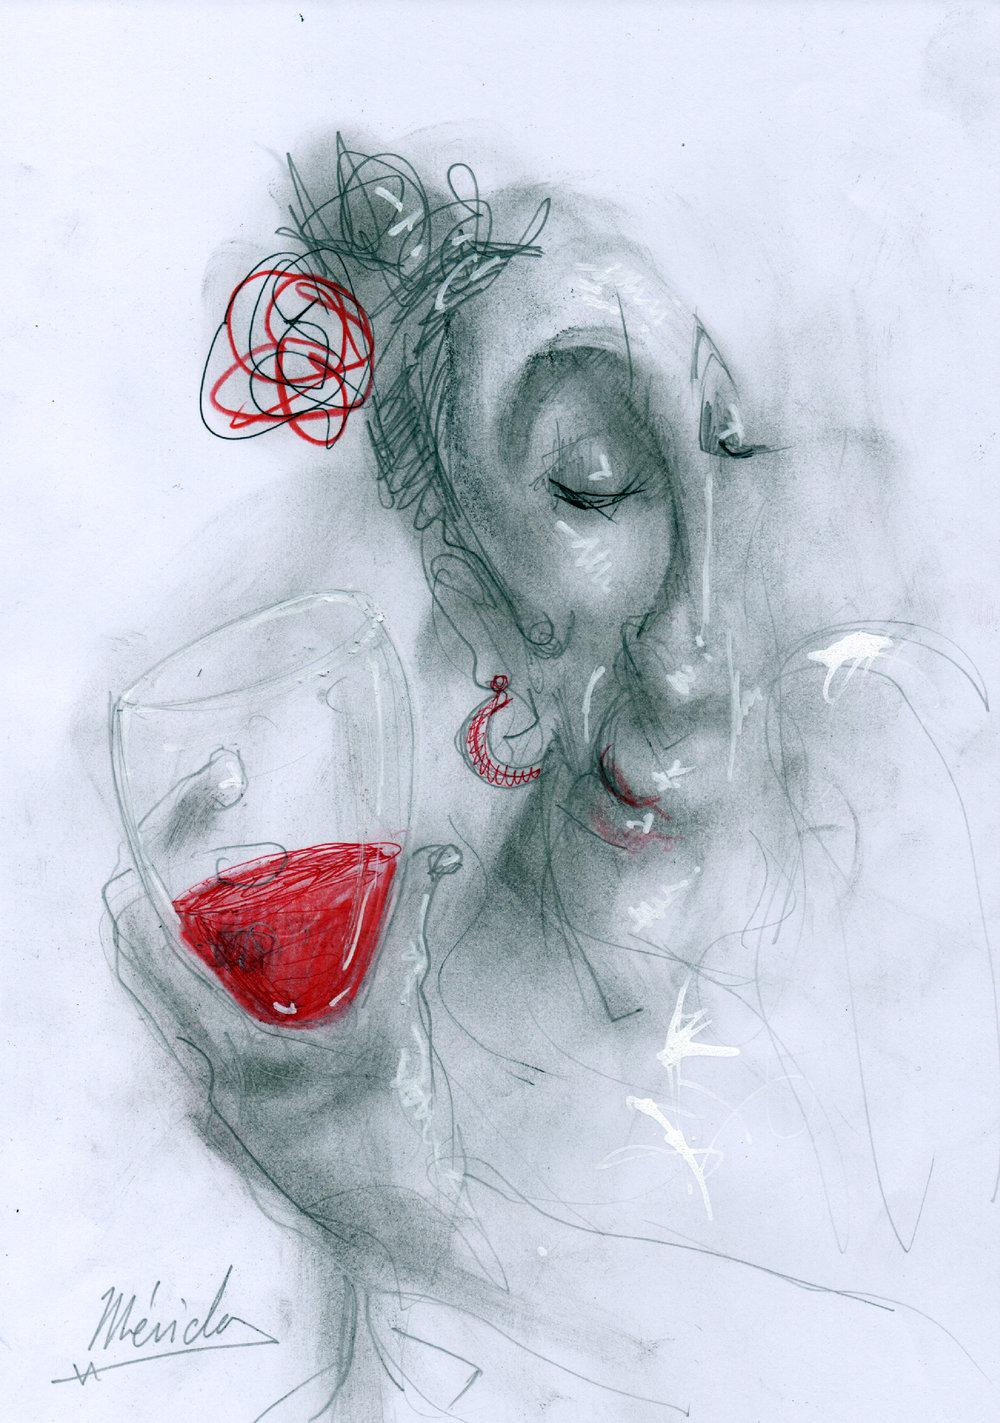 Andres Mérida - La Chata , 2017, Ash, pen, marker on paper,30x21cm.Courtesy of the artist.